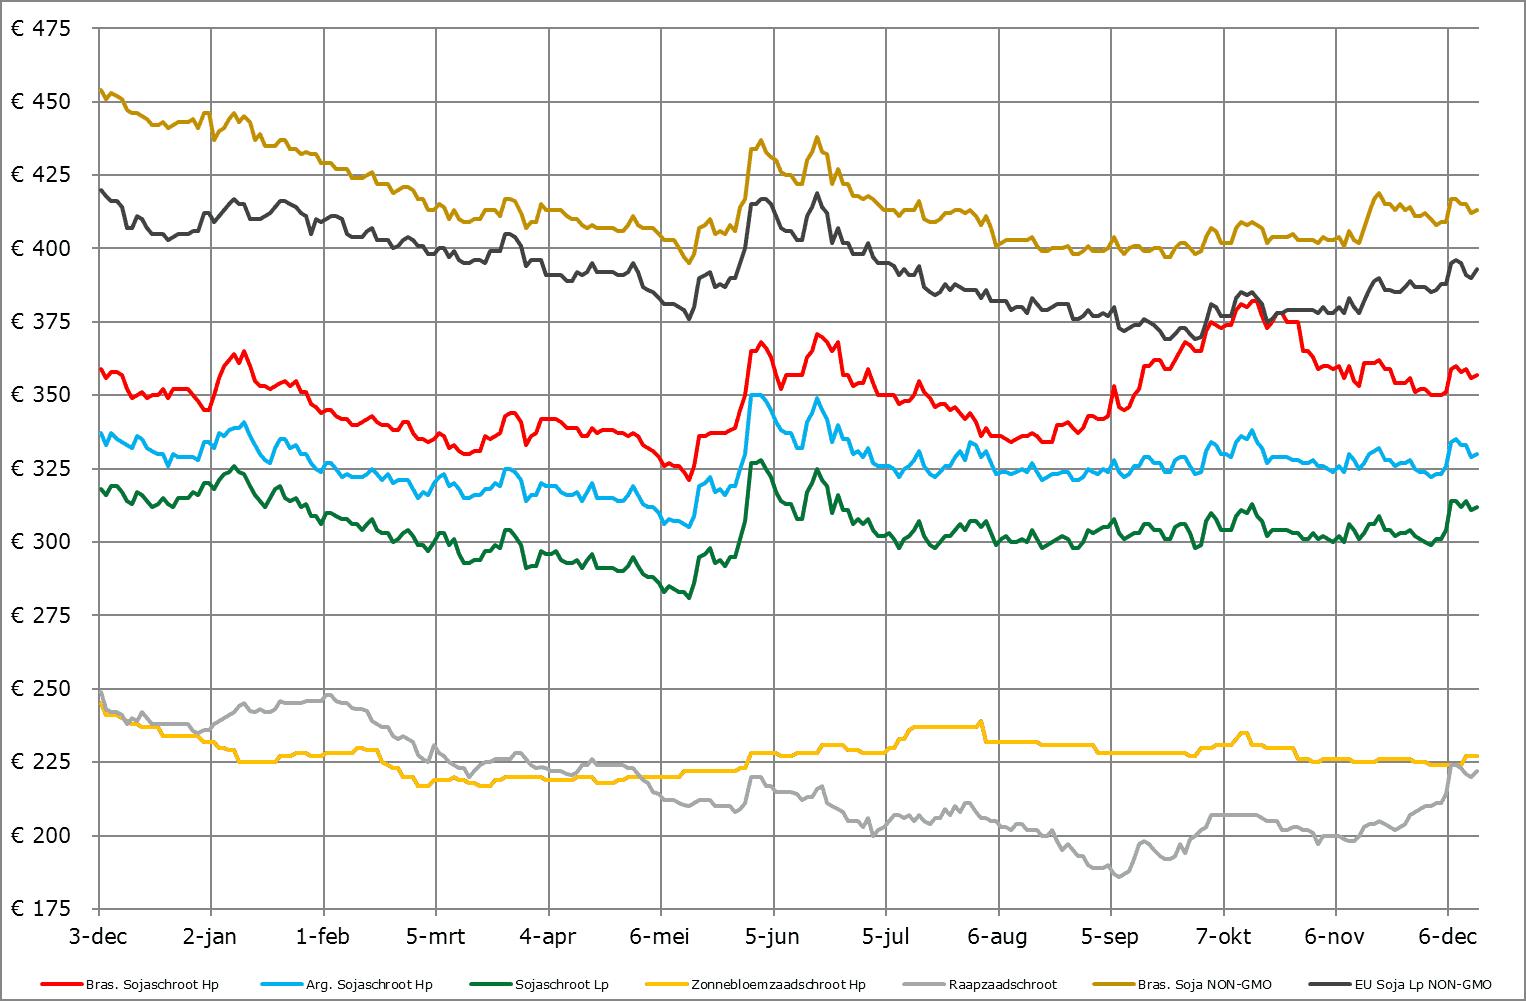 eiwitten prijsverwachting grondstoffen ABZ Diervoeding december 2019